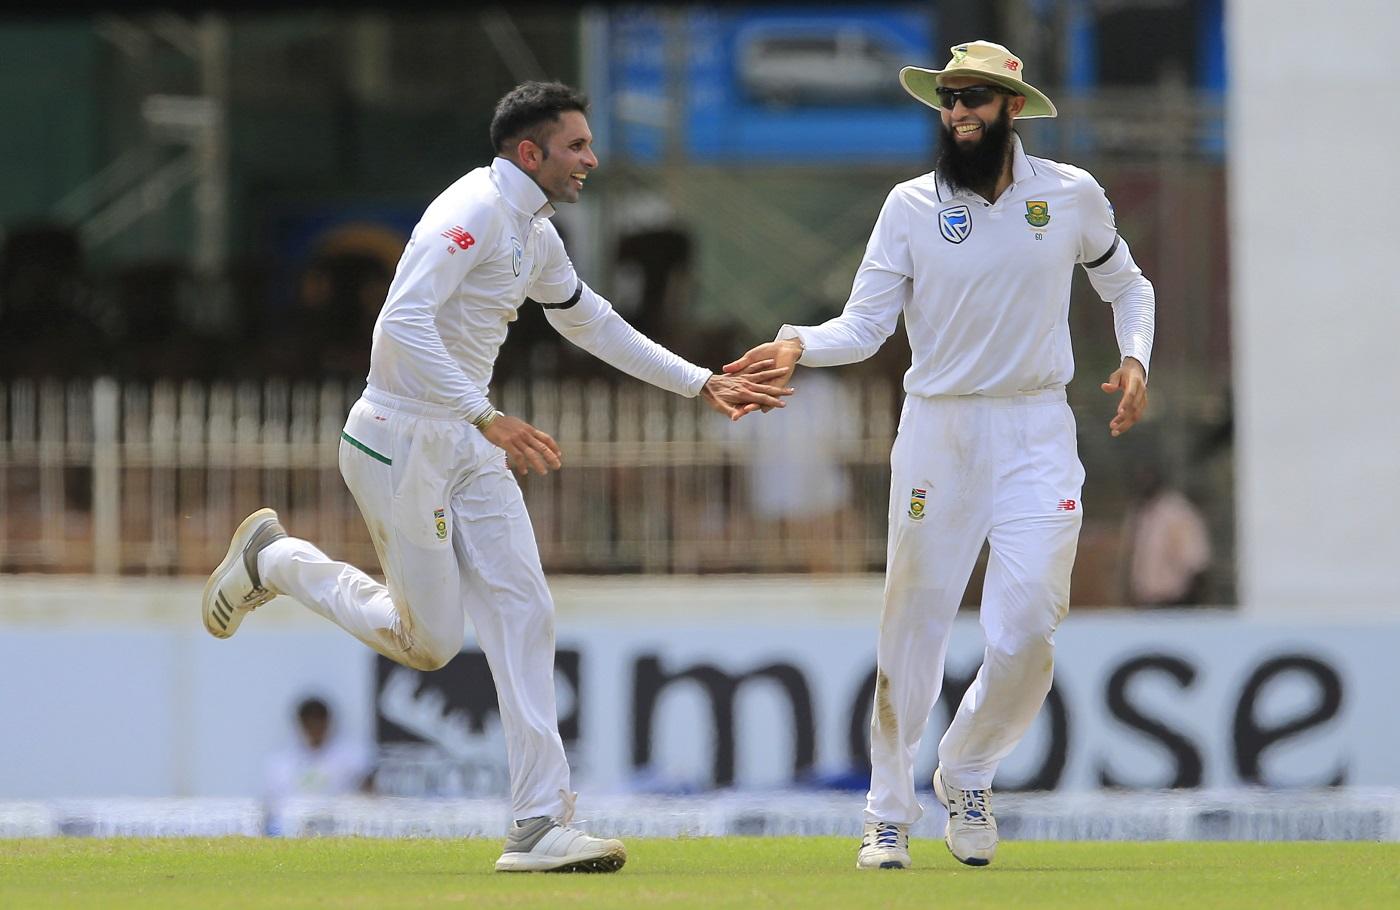 South African cricketers Keshav Maharaj, left, and Hashim Amla celebrate the dismissal of Sri Lanka's Danushka Gunathilaka